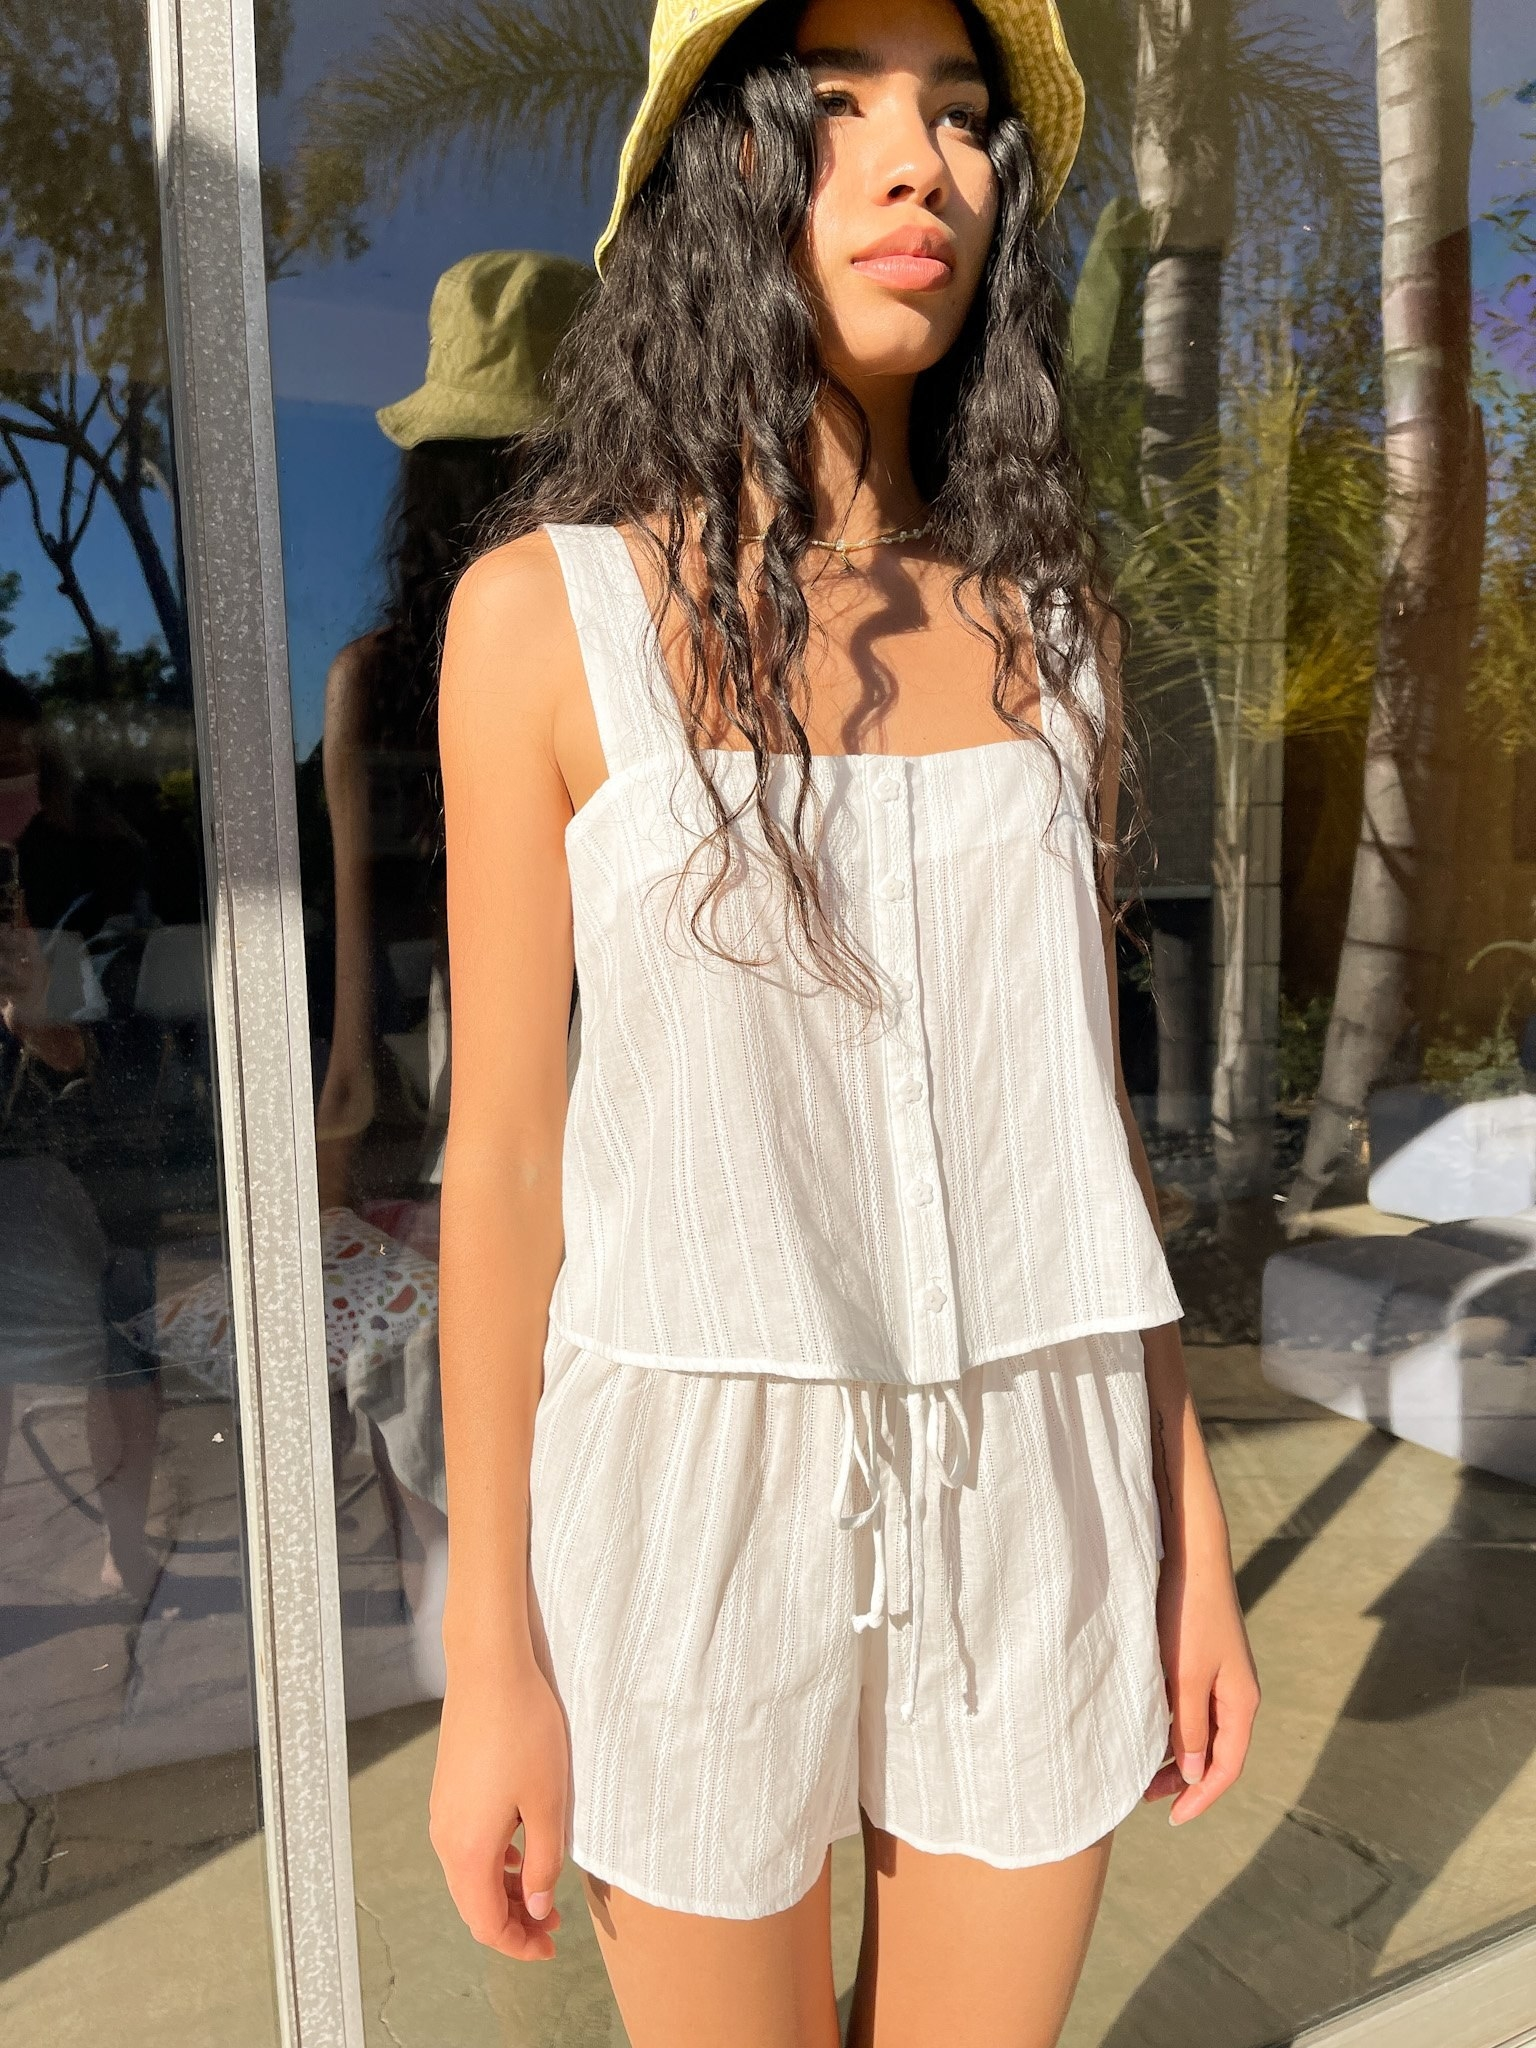 Model wearing shirt and short setn